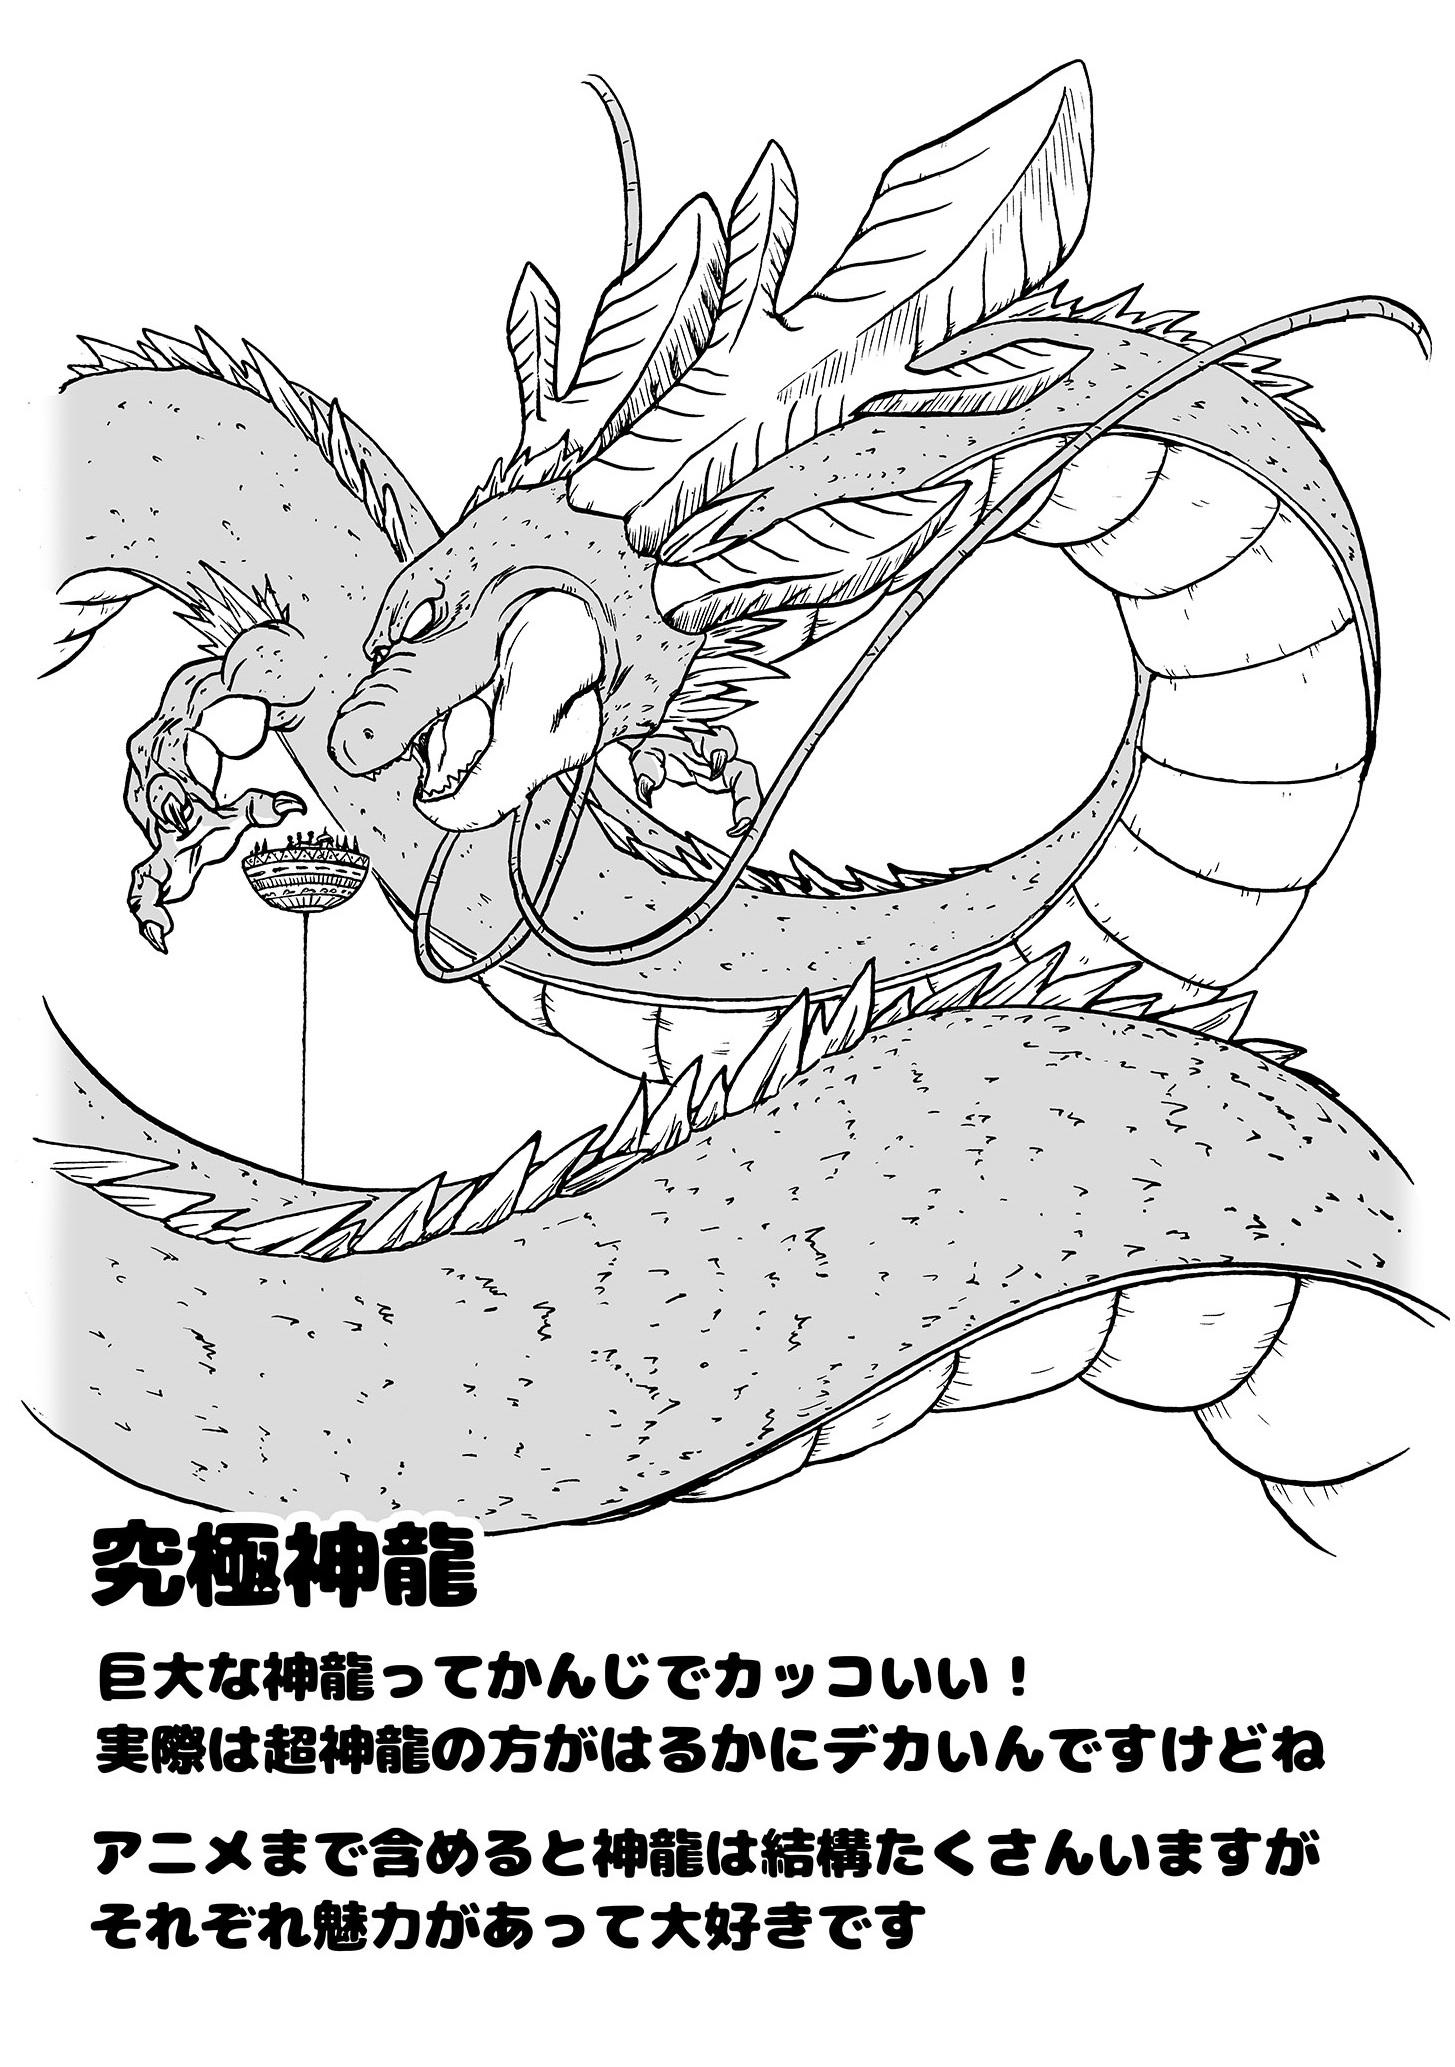 Ultimate Shenron par Toyotaro